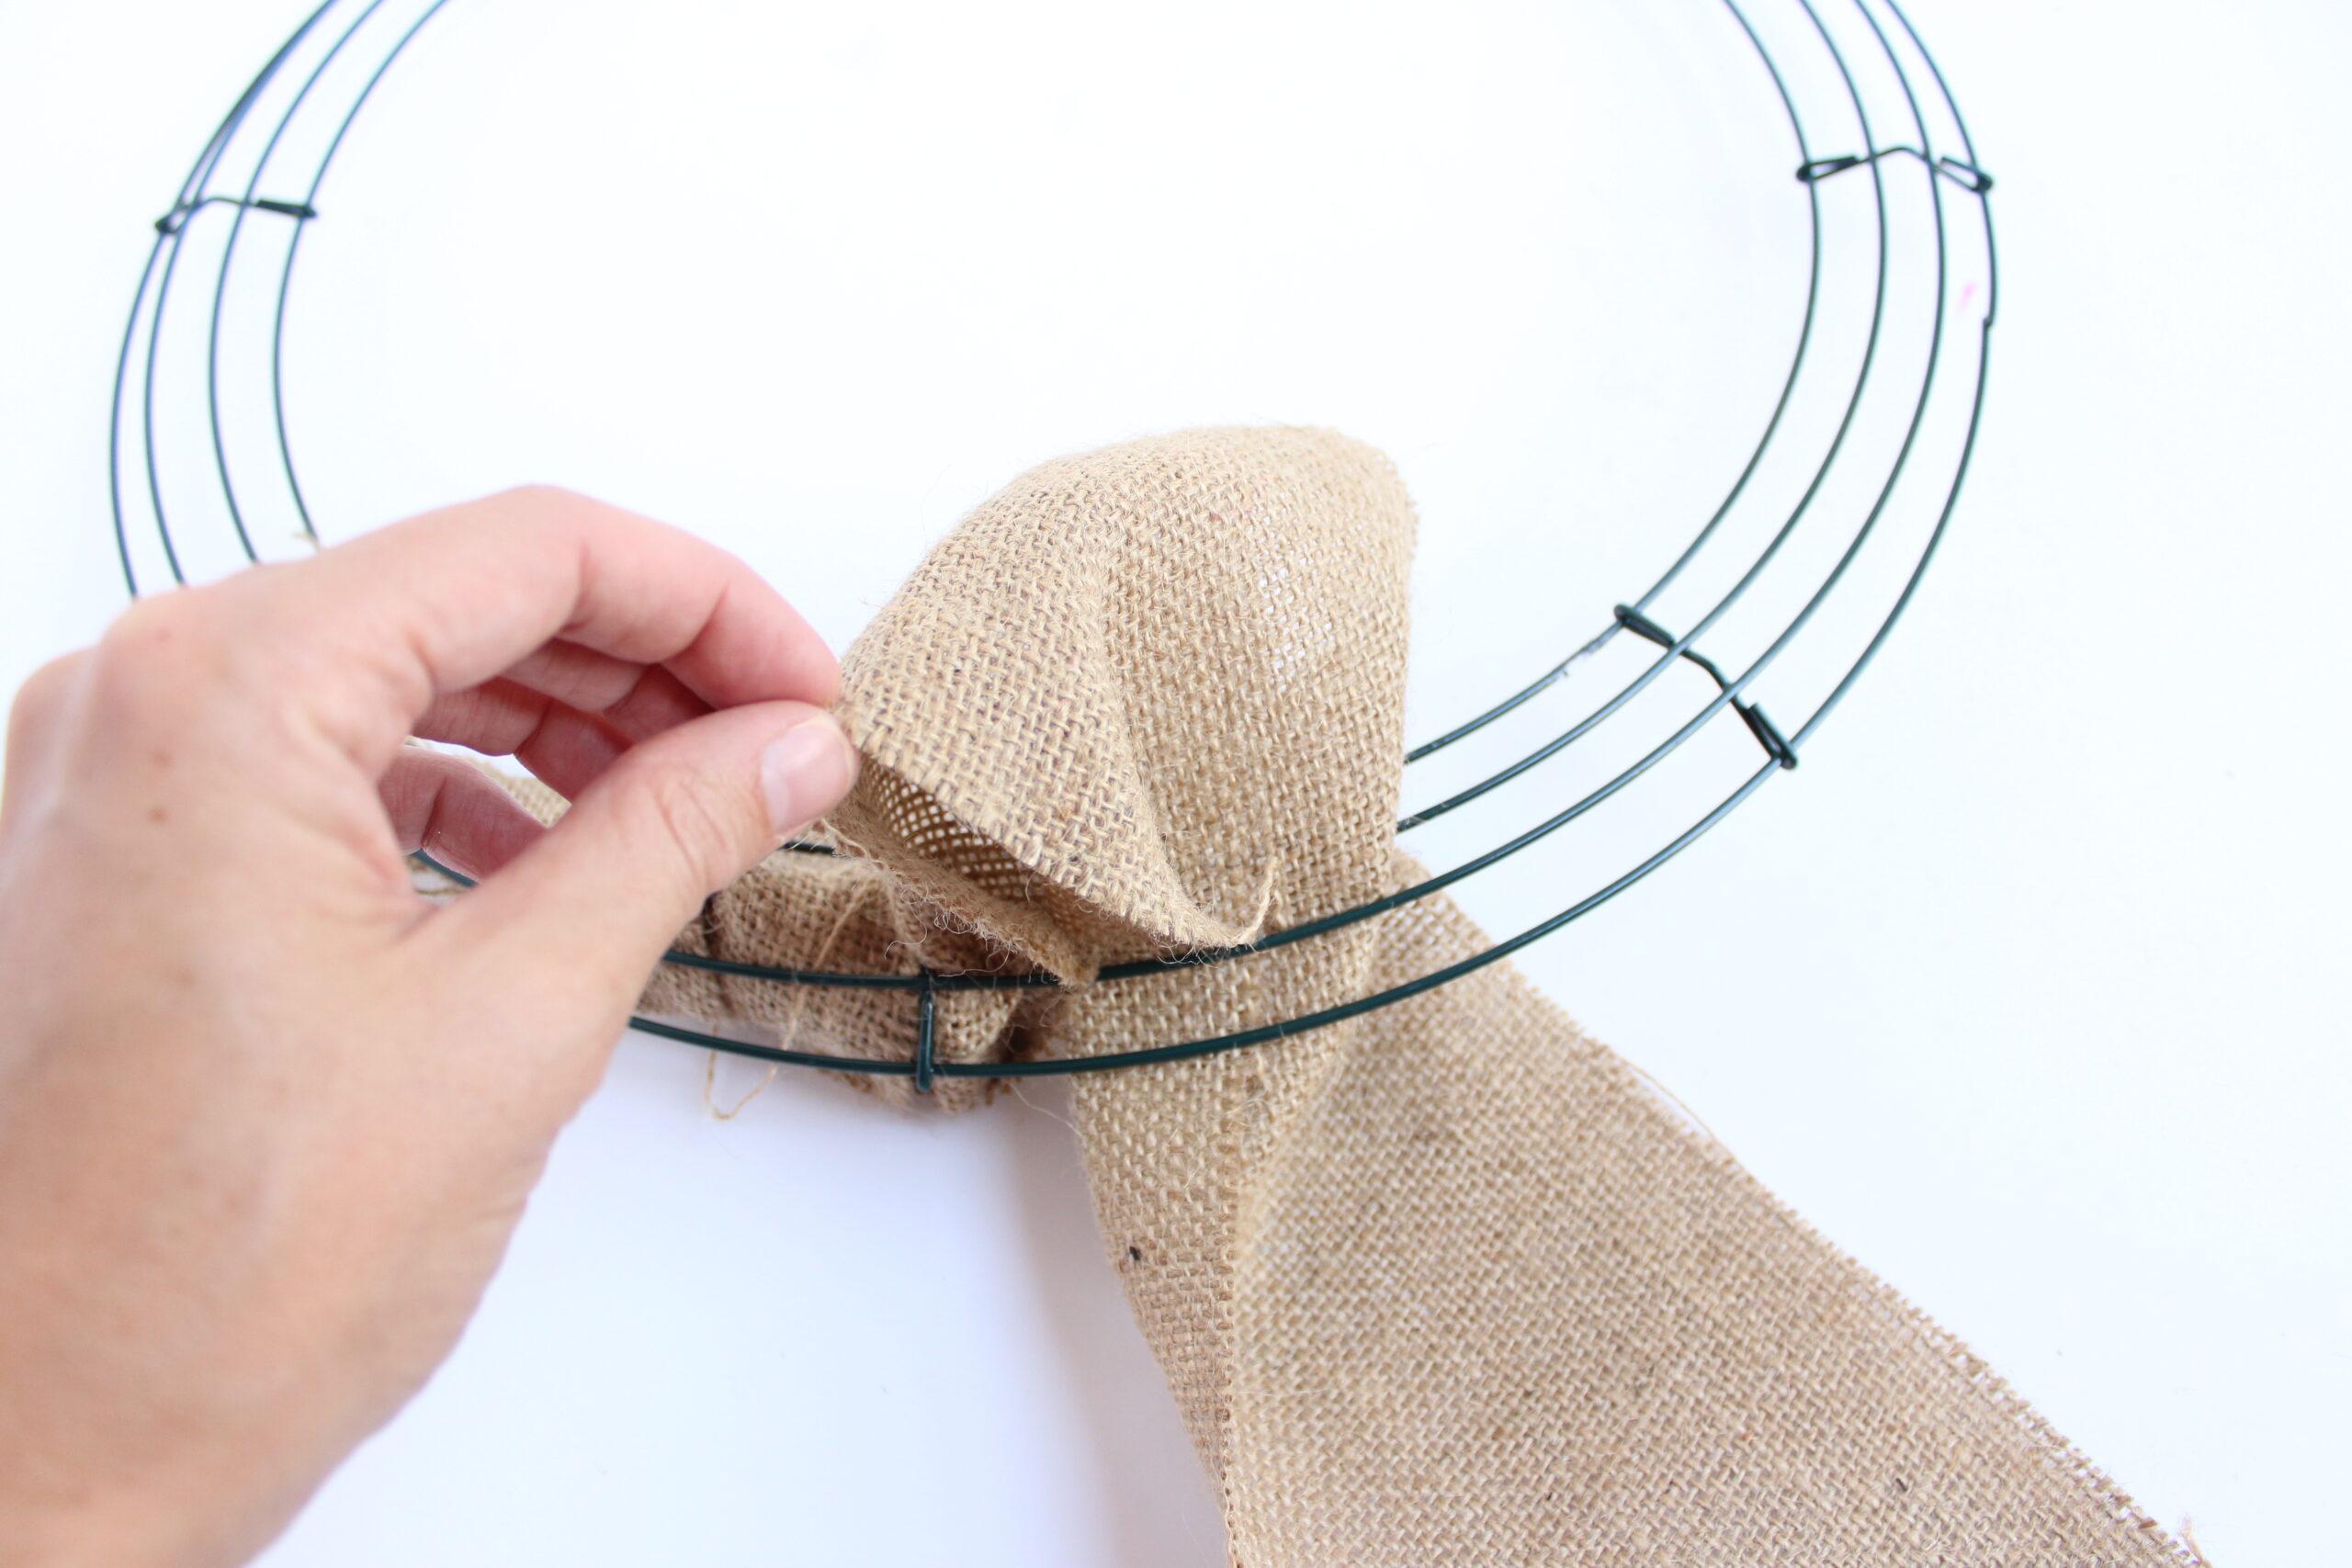 How to create a burlap loop